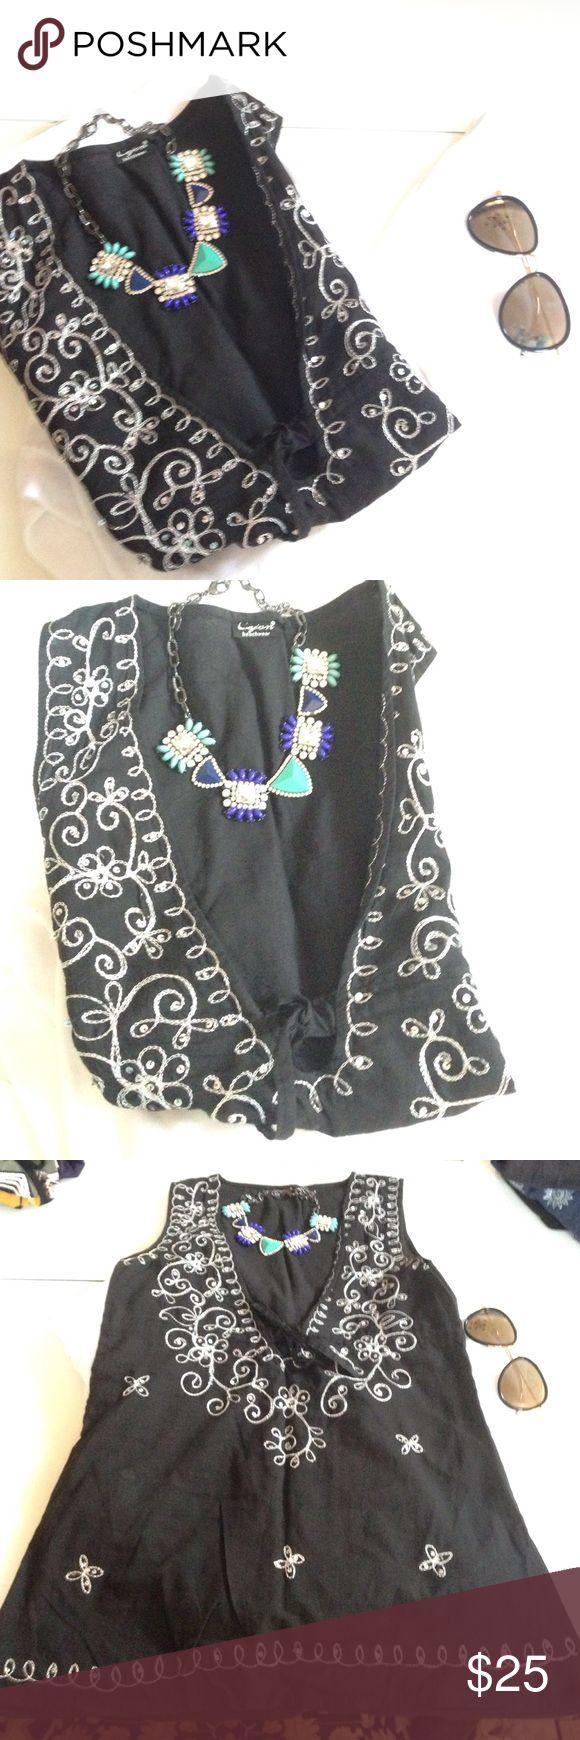 Swim tunic take 20% off sale Blk and silver beachwear tunic .. So gorgeous must see Cejon Swim Coverups